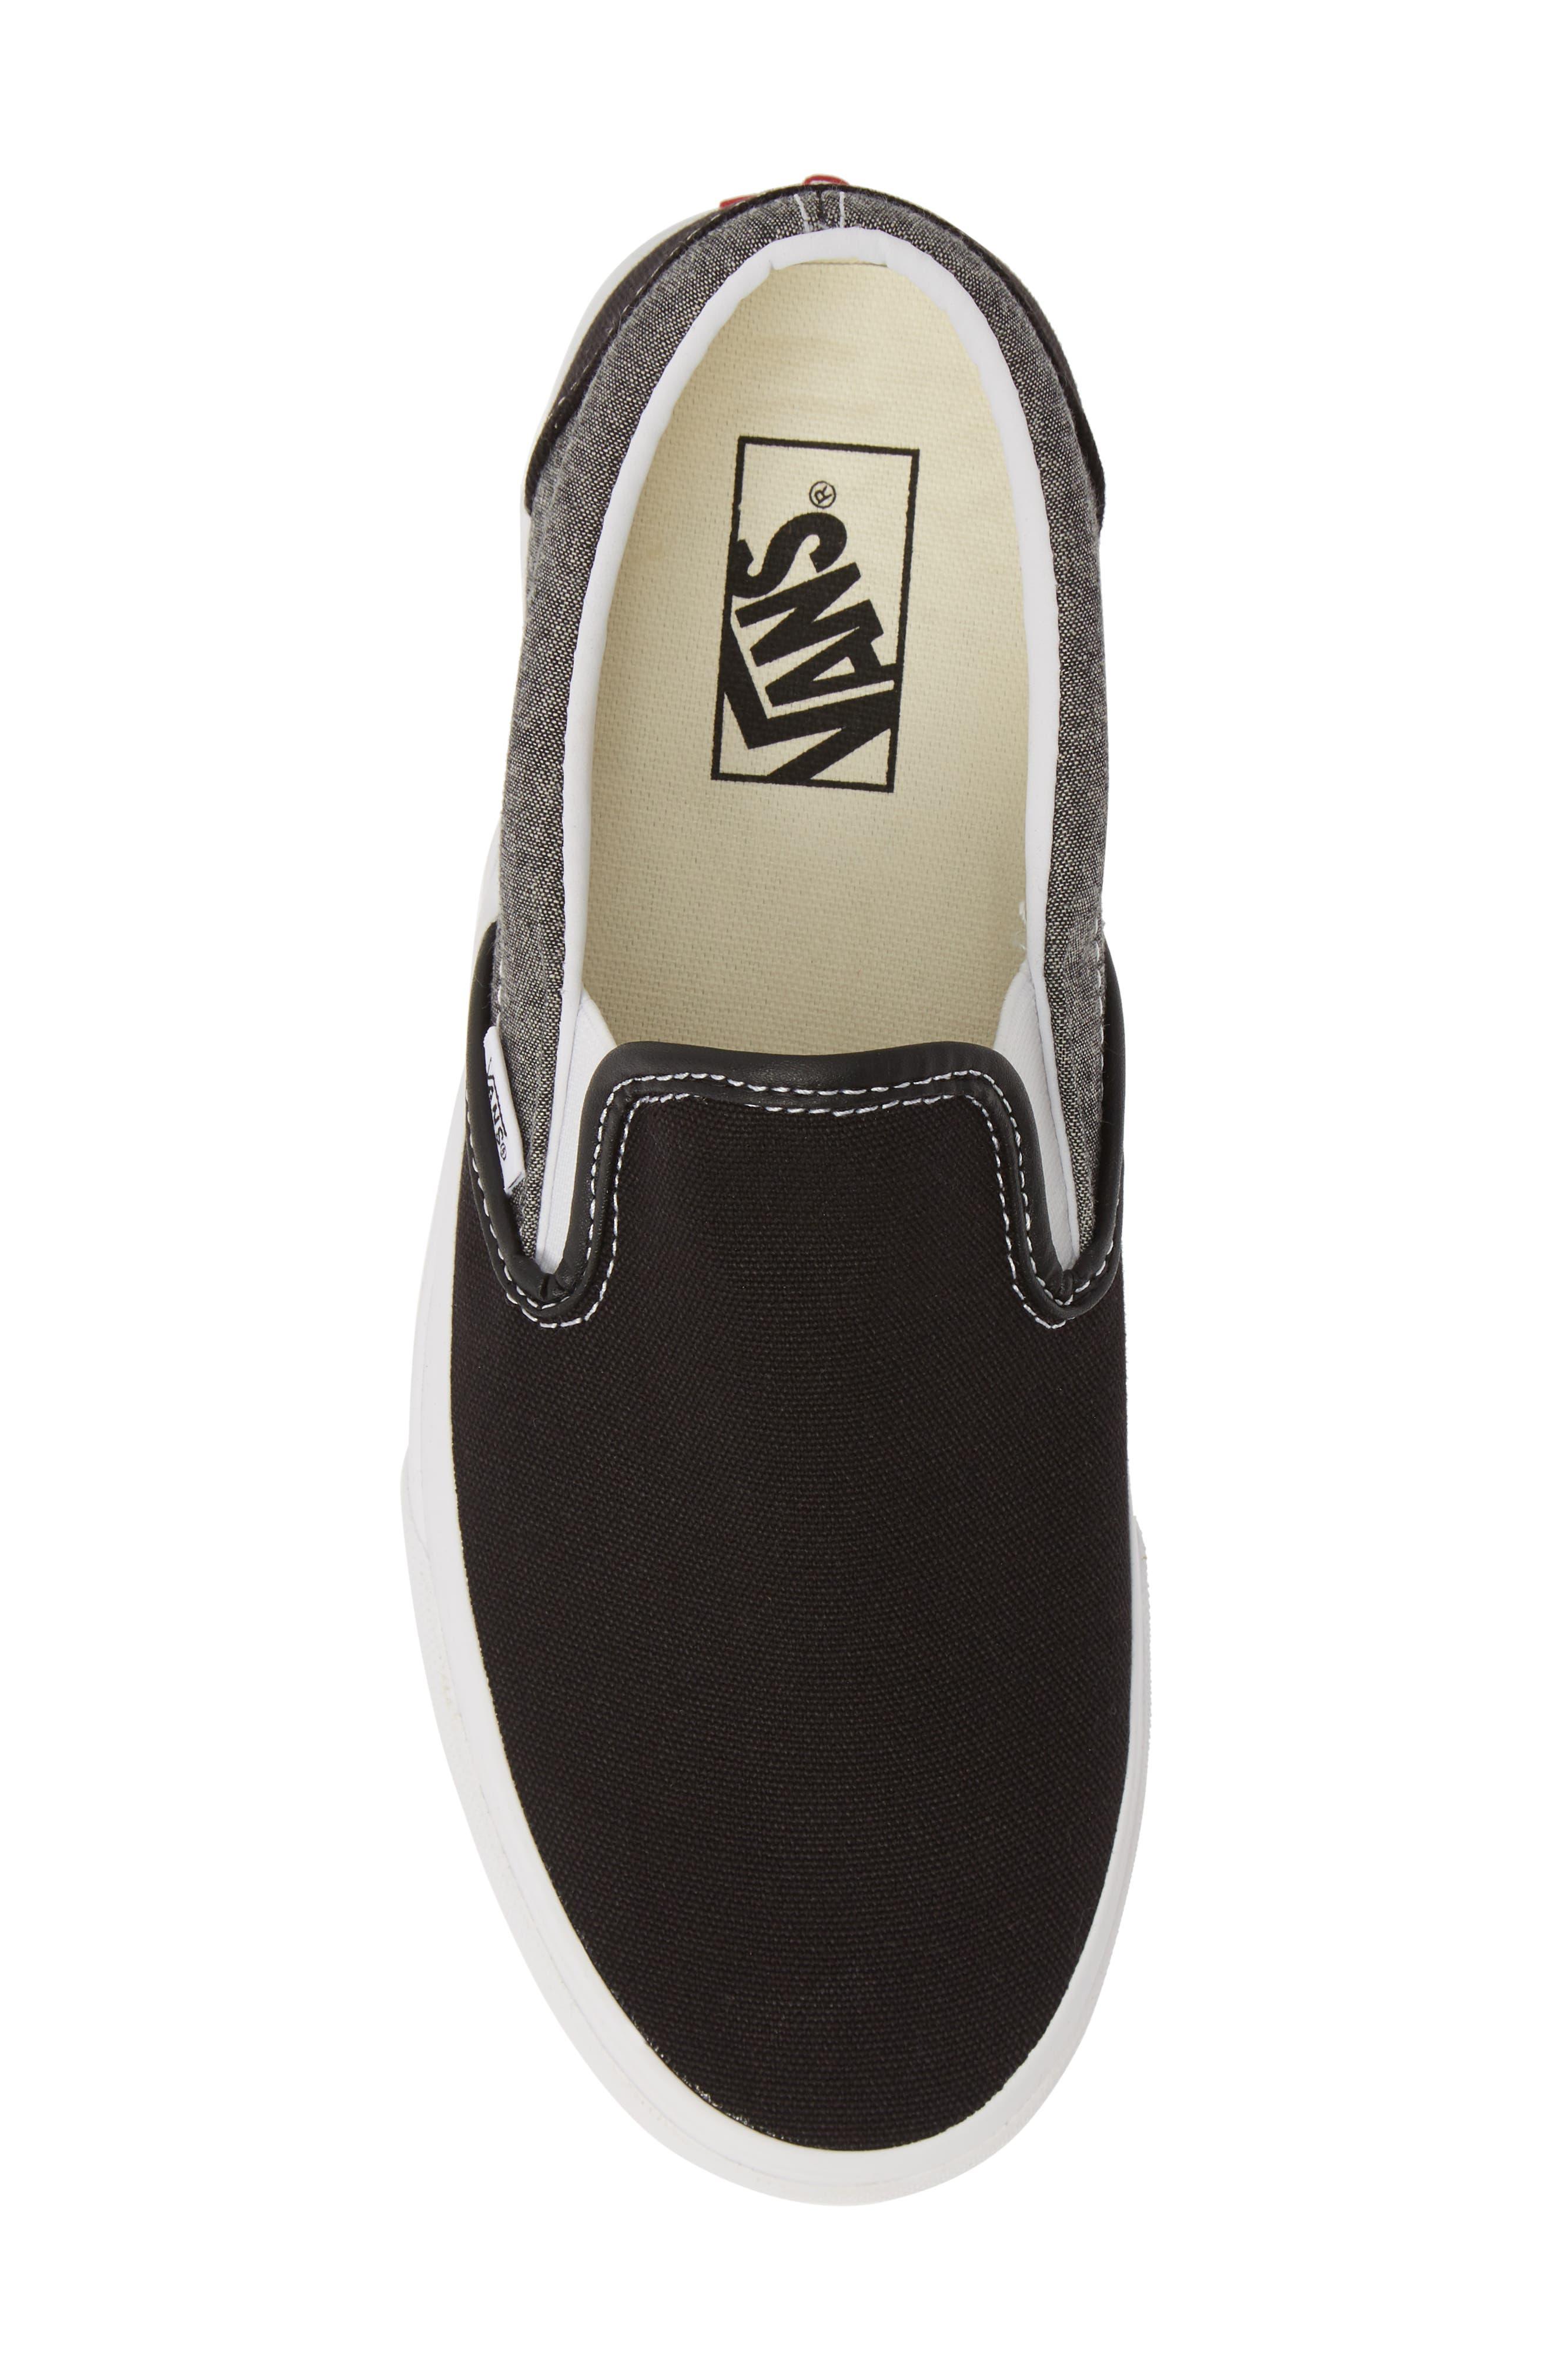 VANS, 'Classic' Slip-On Sneaker, Alternate thumbnail 5, color, CANVAS BLACK/ WHITE CHAMBRAY